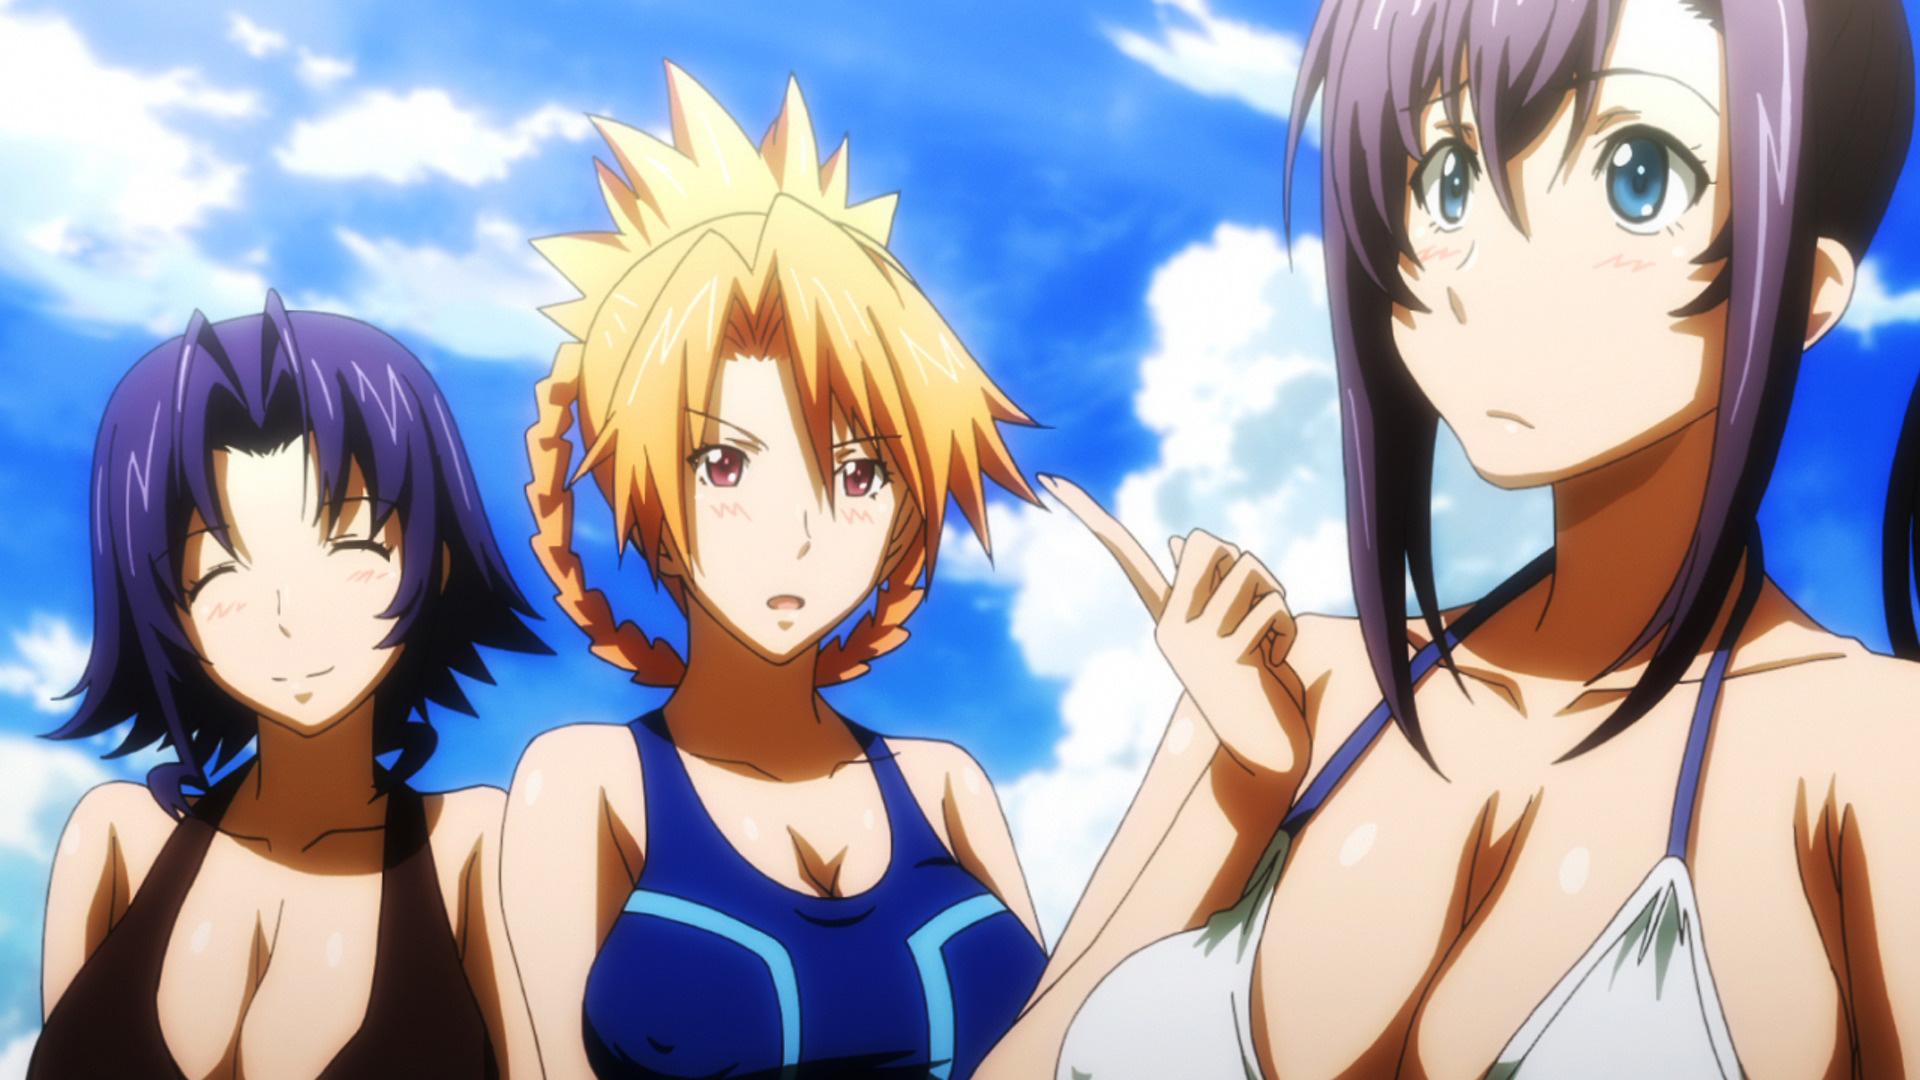 Octopus Decor Watch Maken Ki Season 1 Episode 13 Anime On Funimation